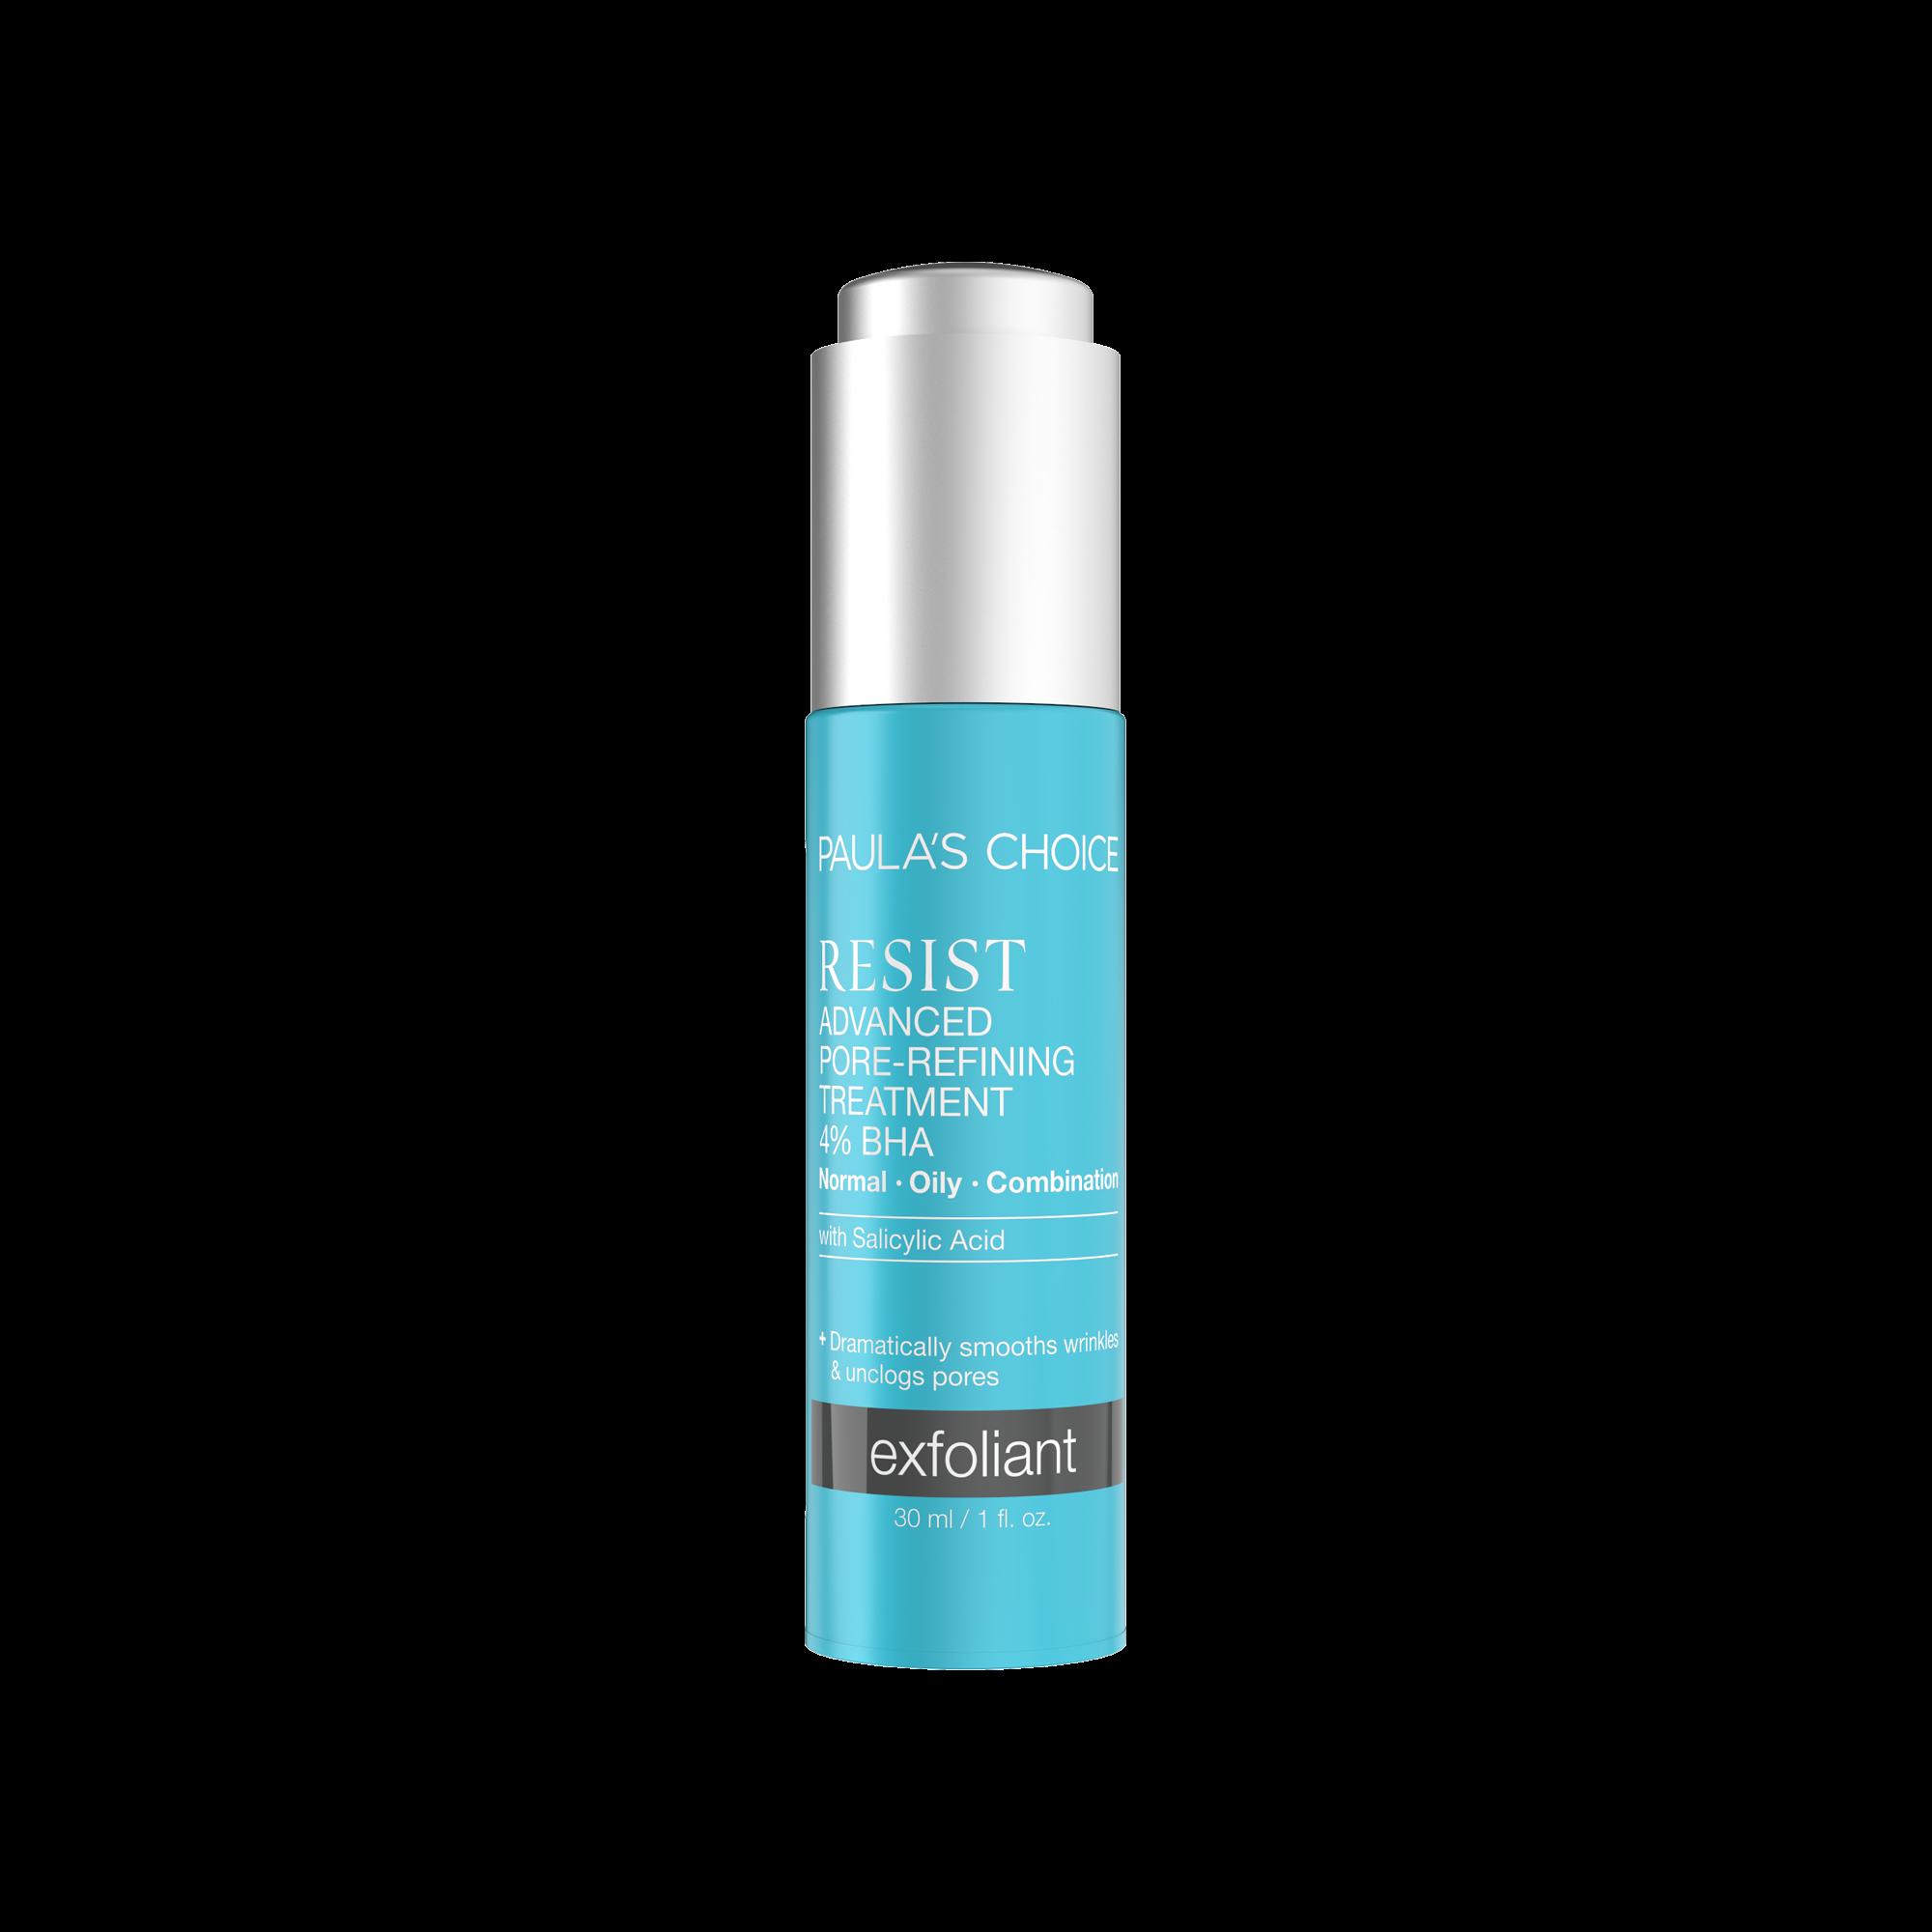 resist-advanced-pore-refining-treatment-with-4-percent-bha-7791-L.png